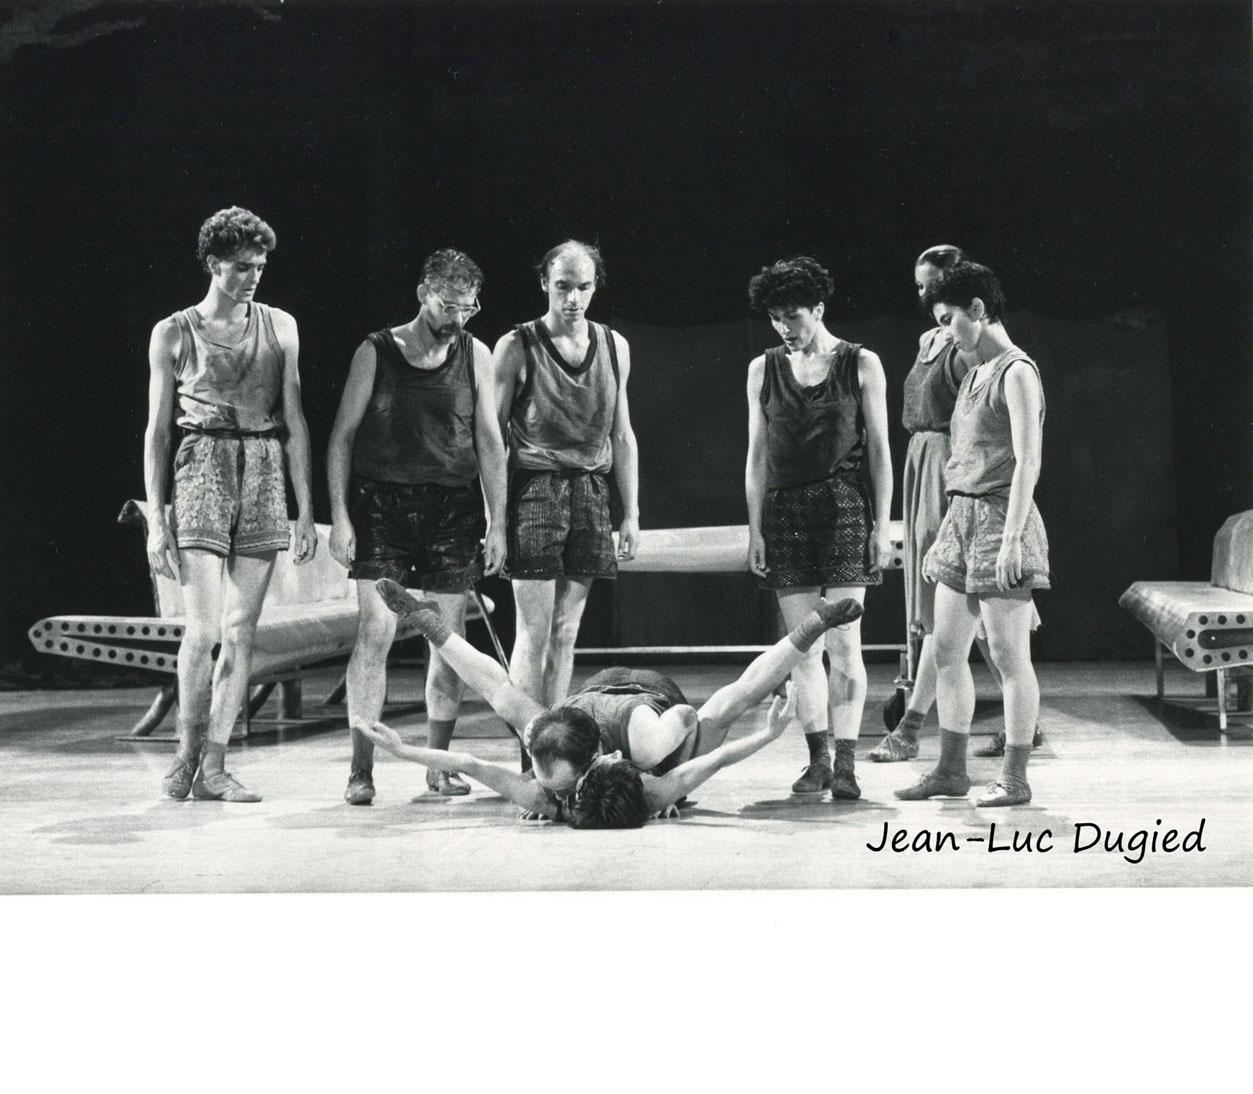 20 Gallotta Jean-Claude - mammame 1 le désert d'Arkadine - 1986